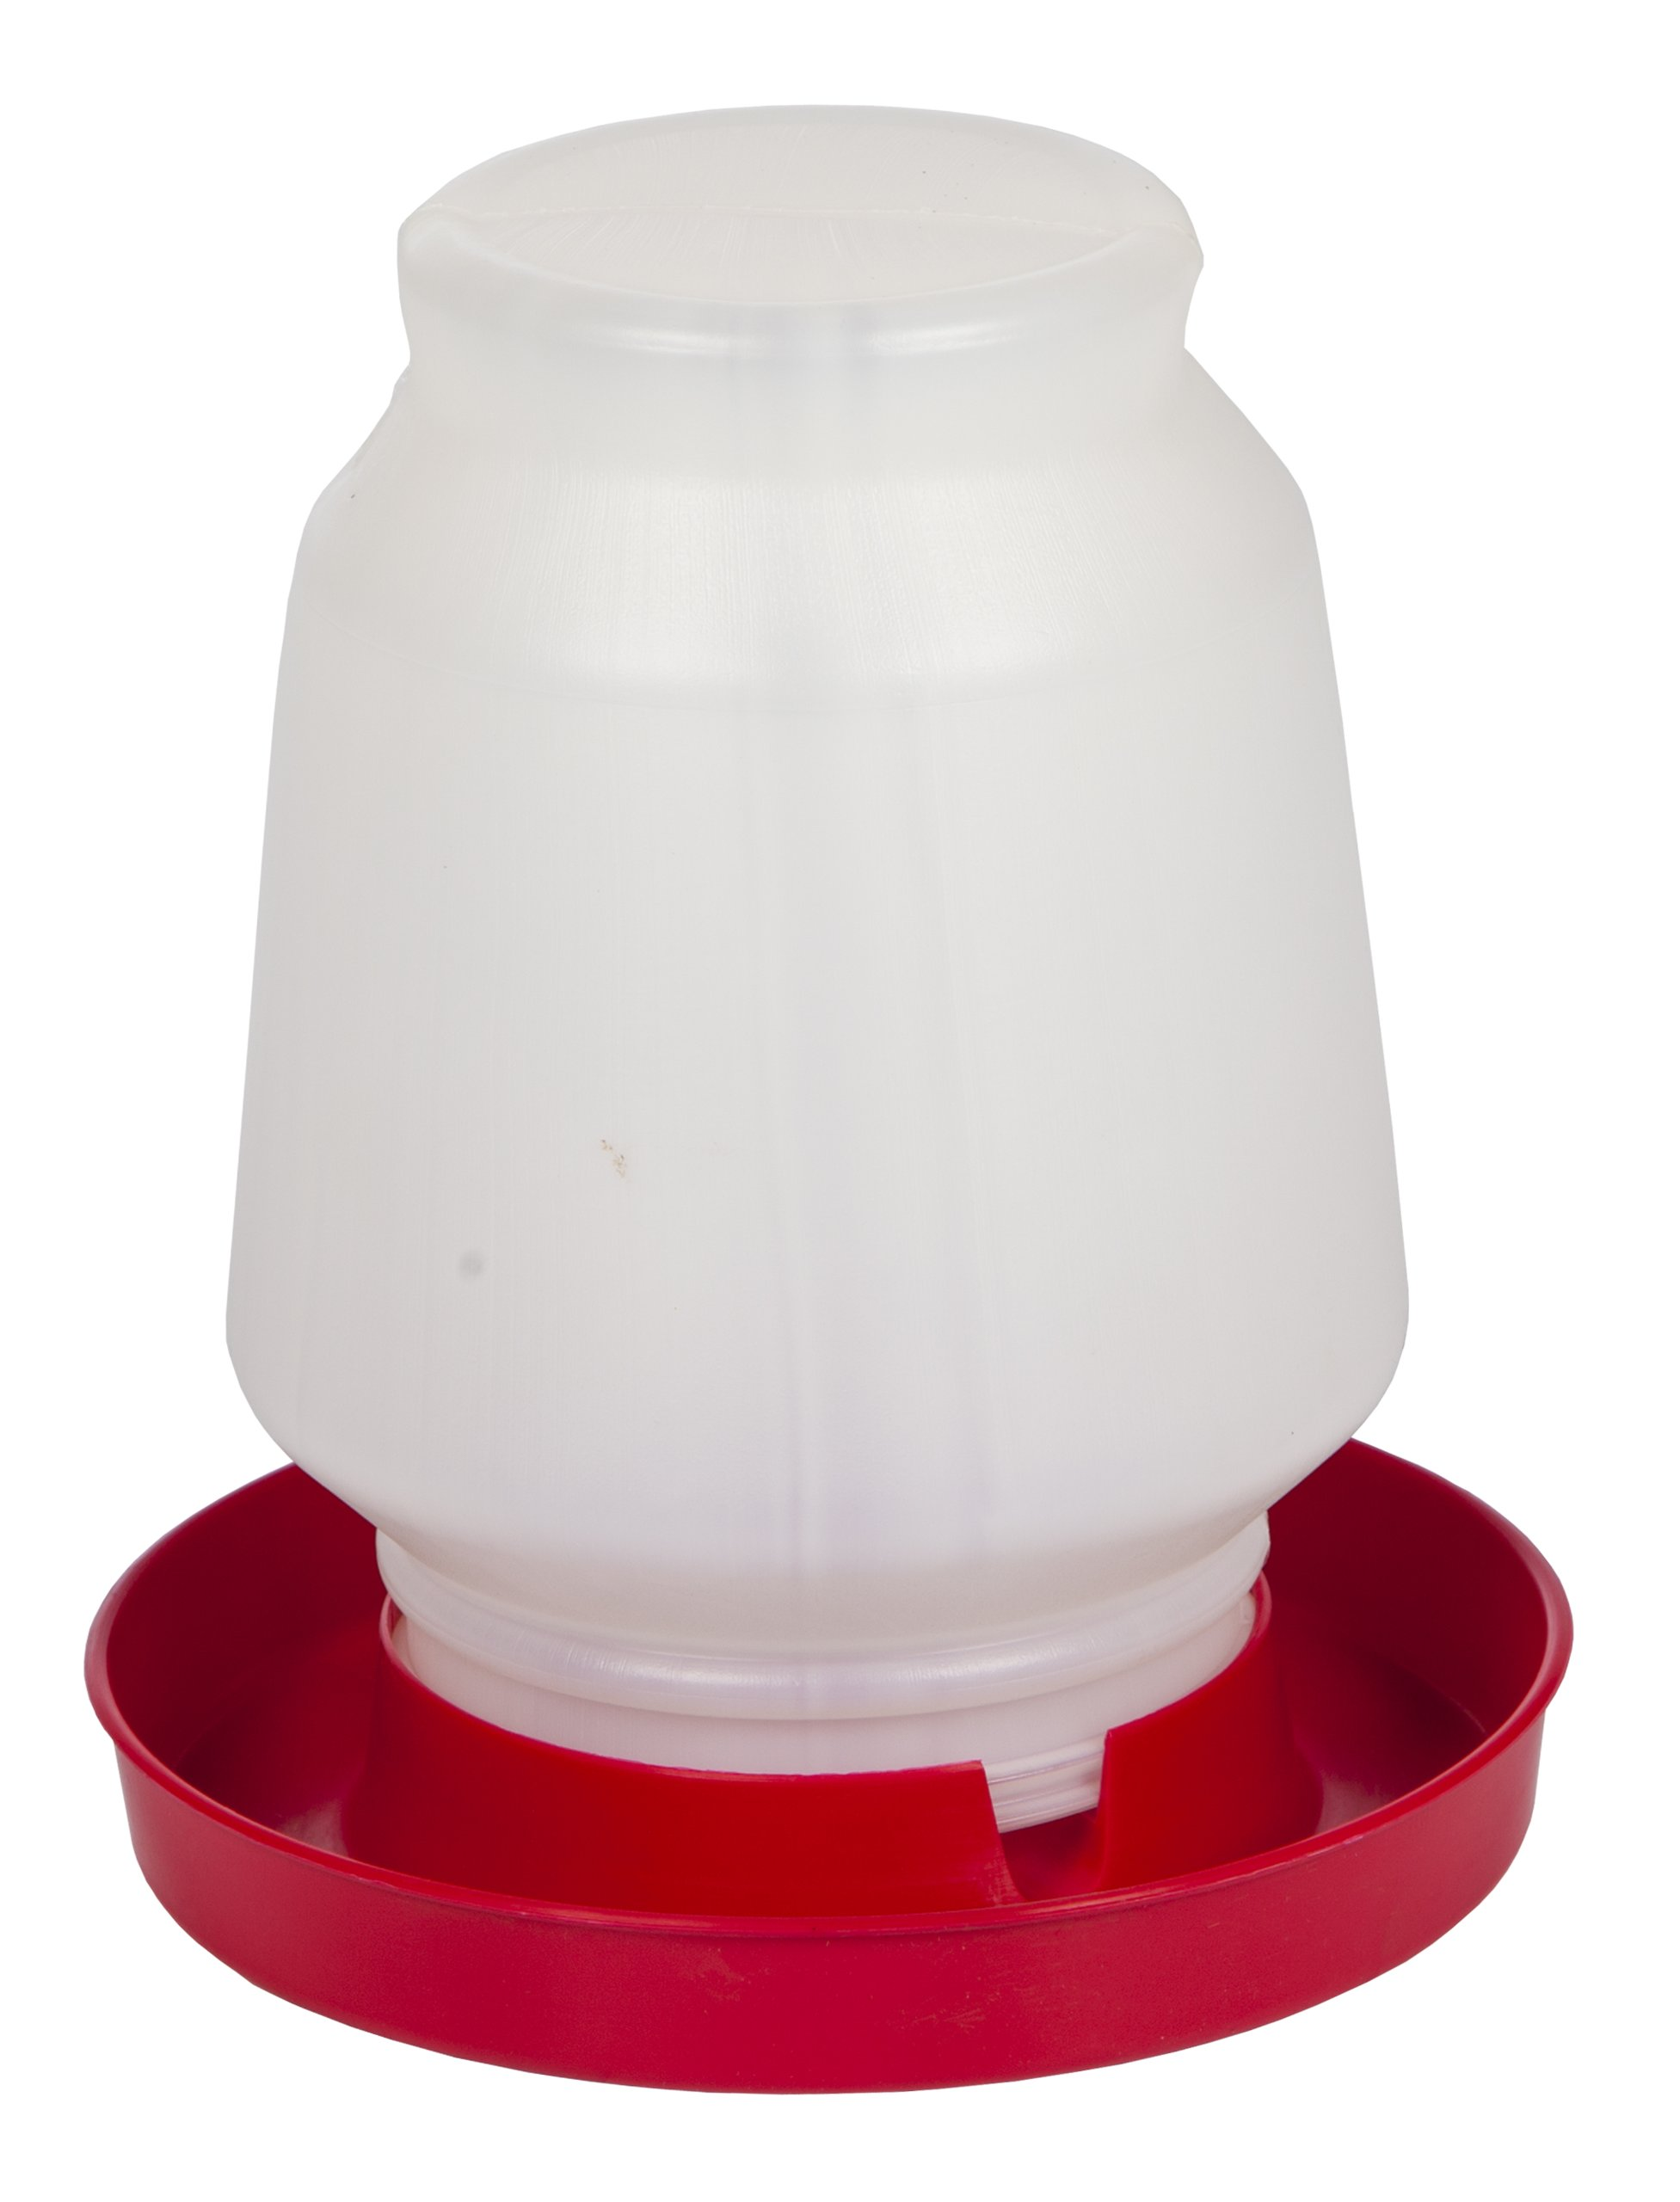 Farm Tuff Automatic Fountain Poultry Waterer, 1-Gallon